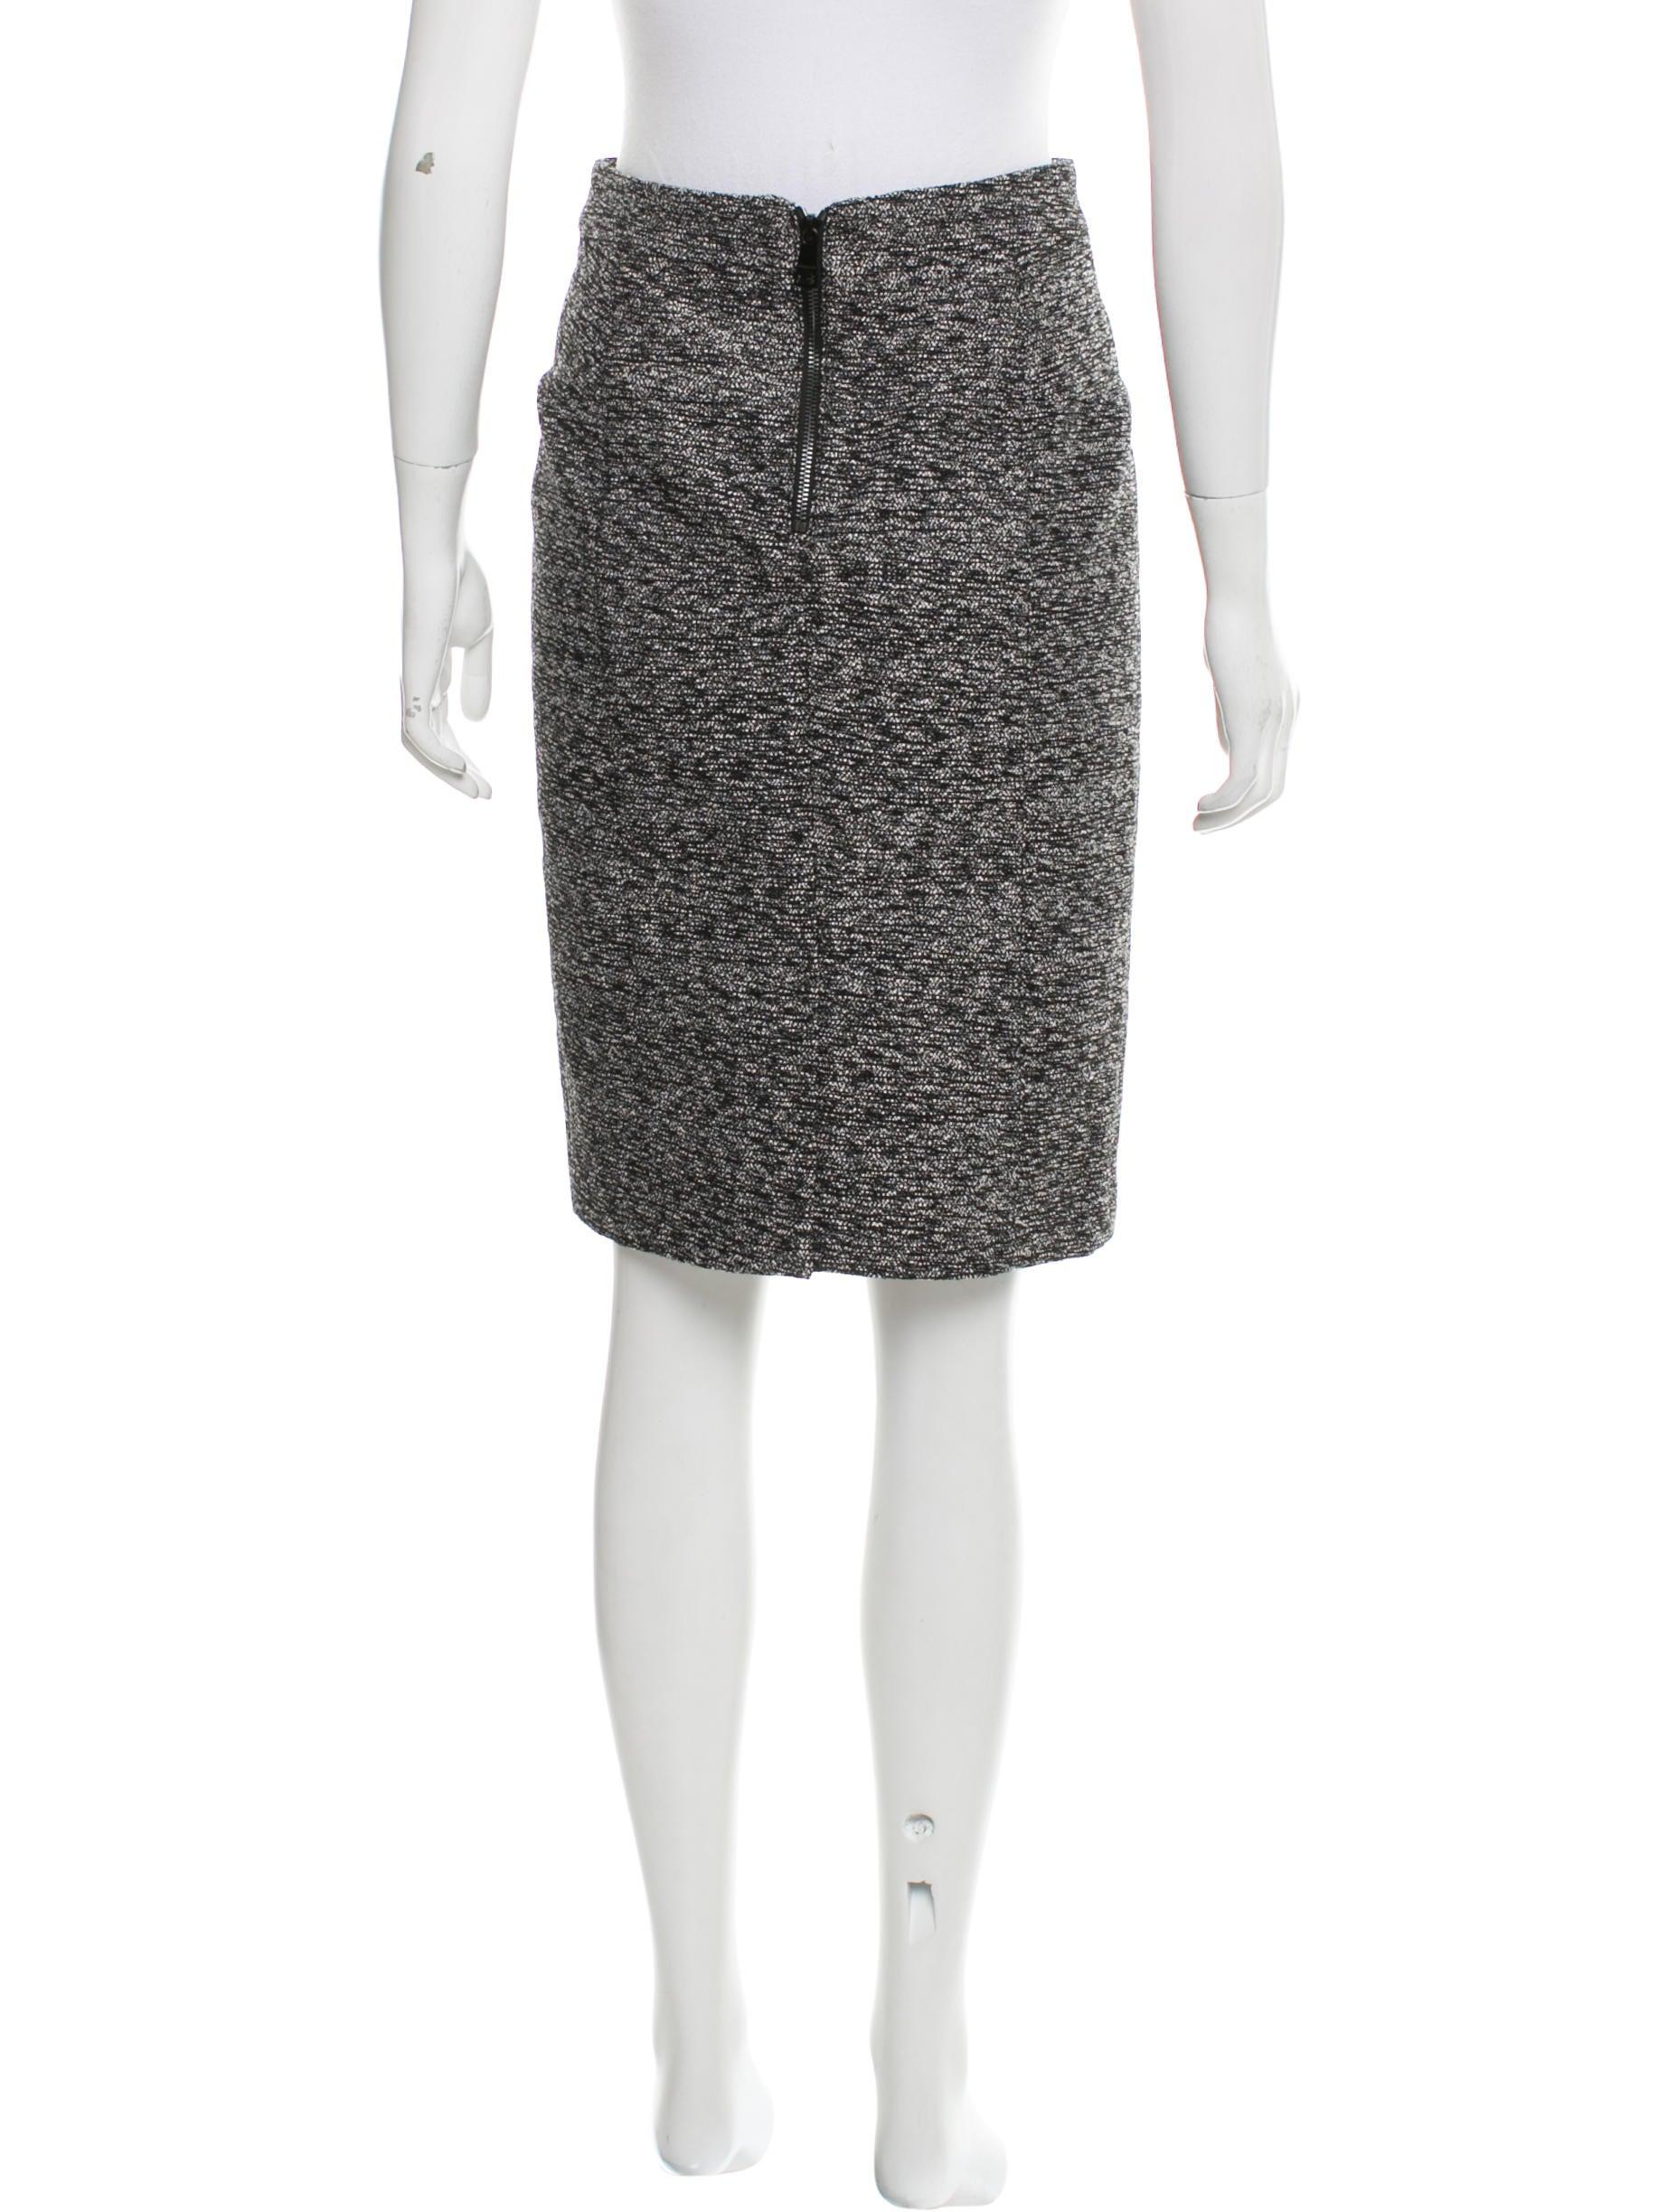 Burberry Knee-Length Pencil Skirt - Clothing